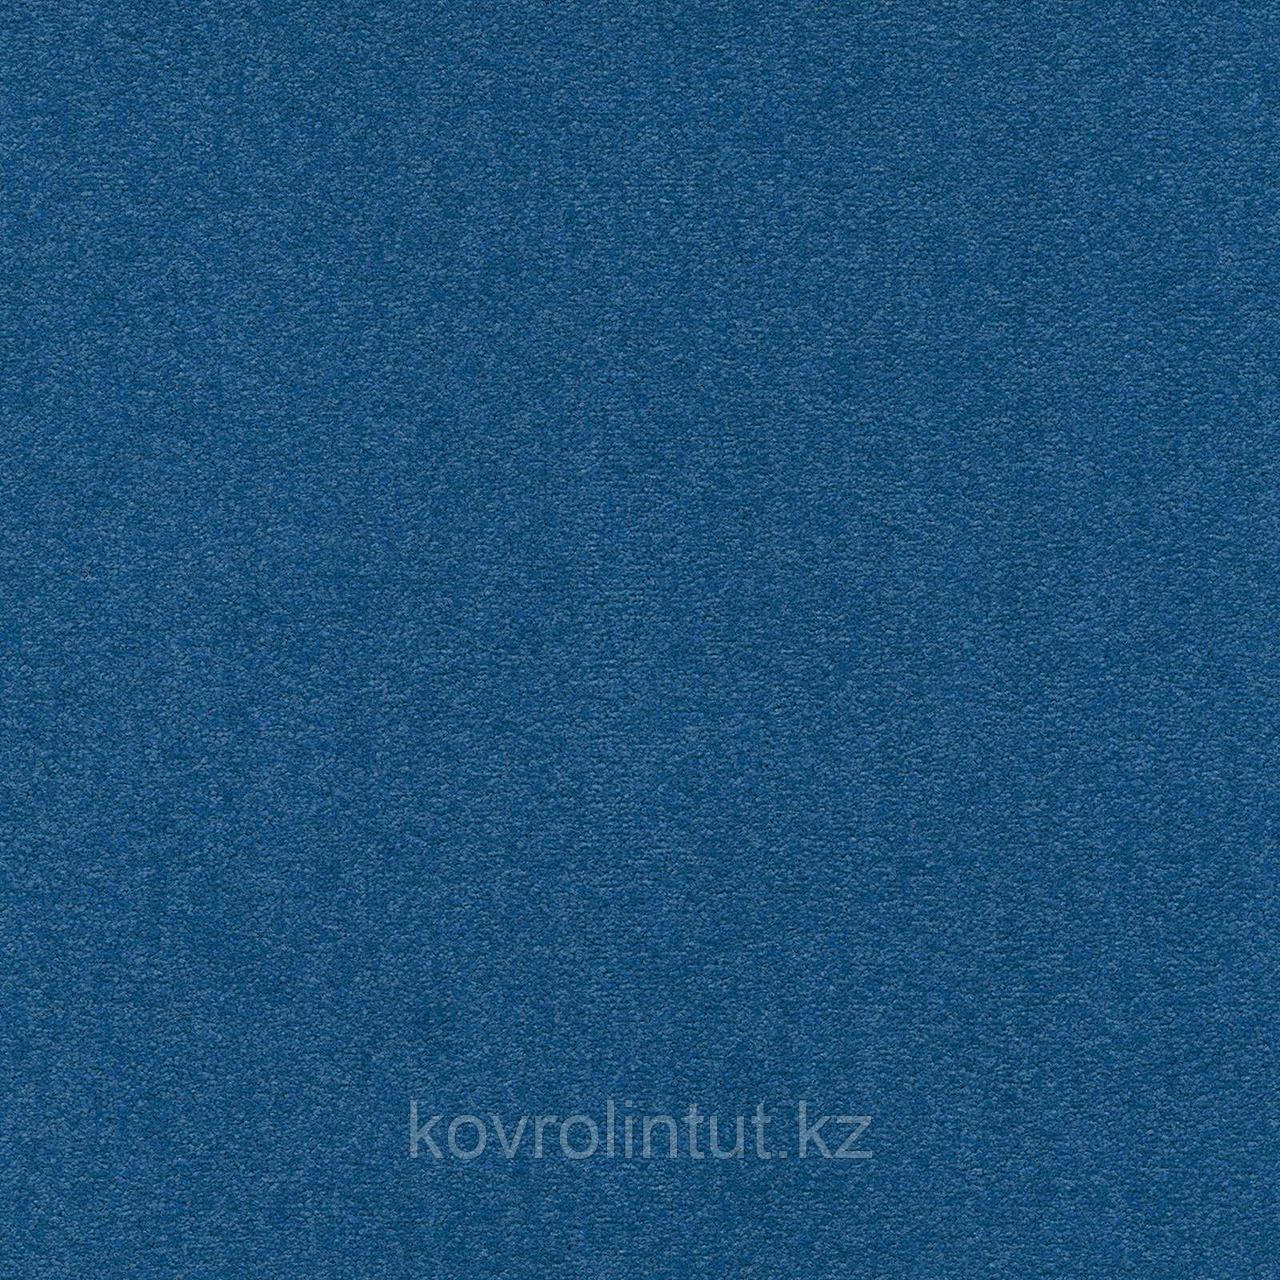 Плитка ковровая Modulyss Cambridge 569, 100% PA